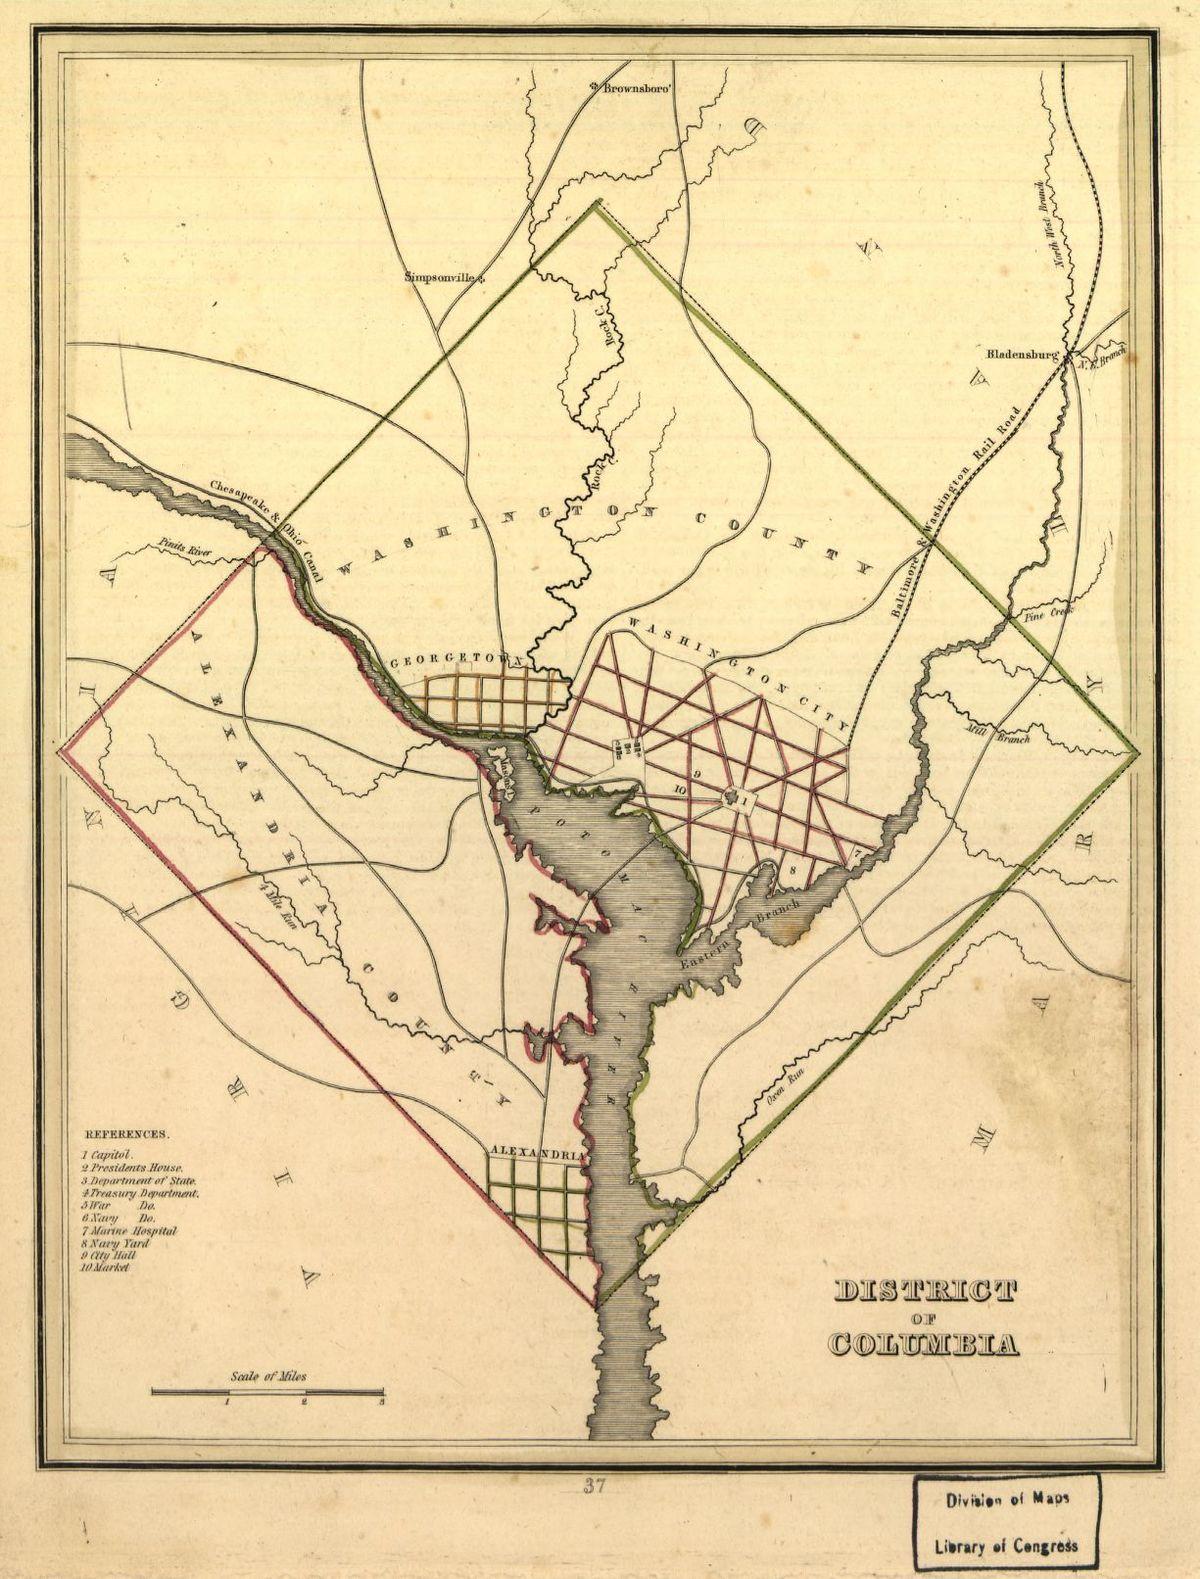 Washington County DC Wikipedia - Washington dc pop up map